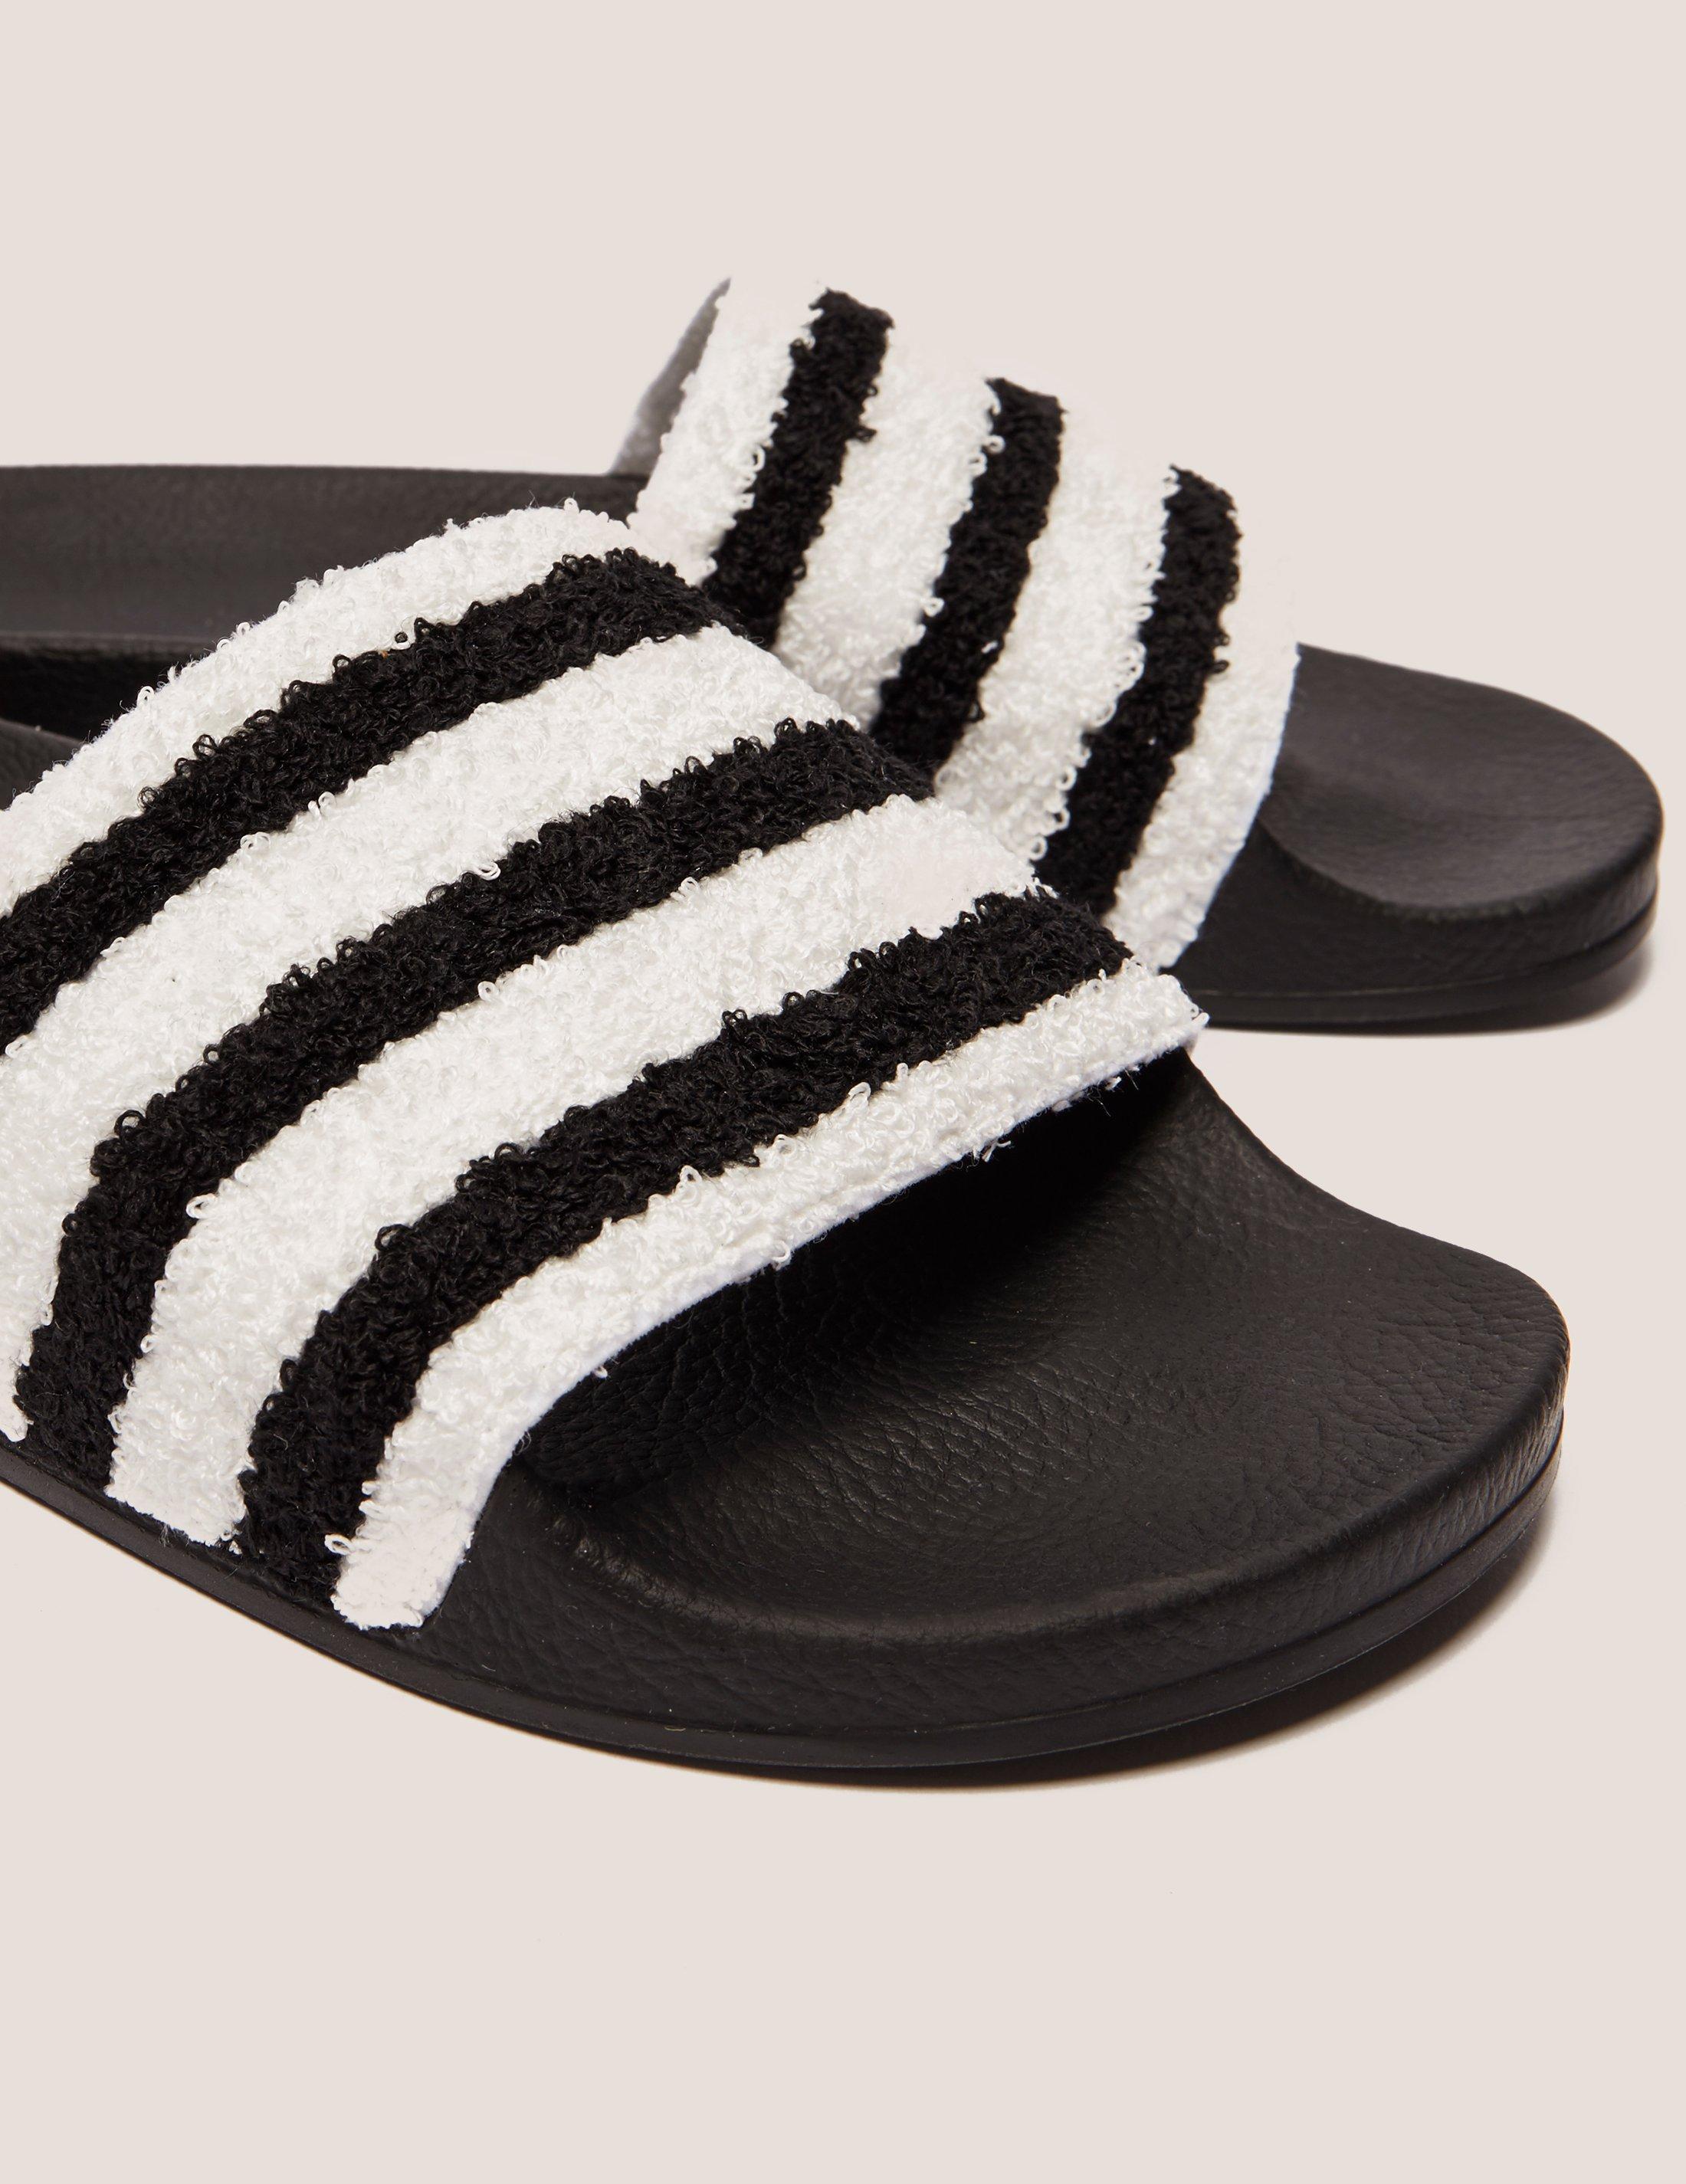 051ee9a4df1f04 Lyst - adidas Originals Adilette Towel Slides in Black for Men